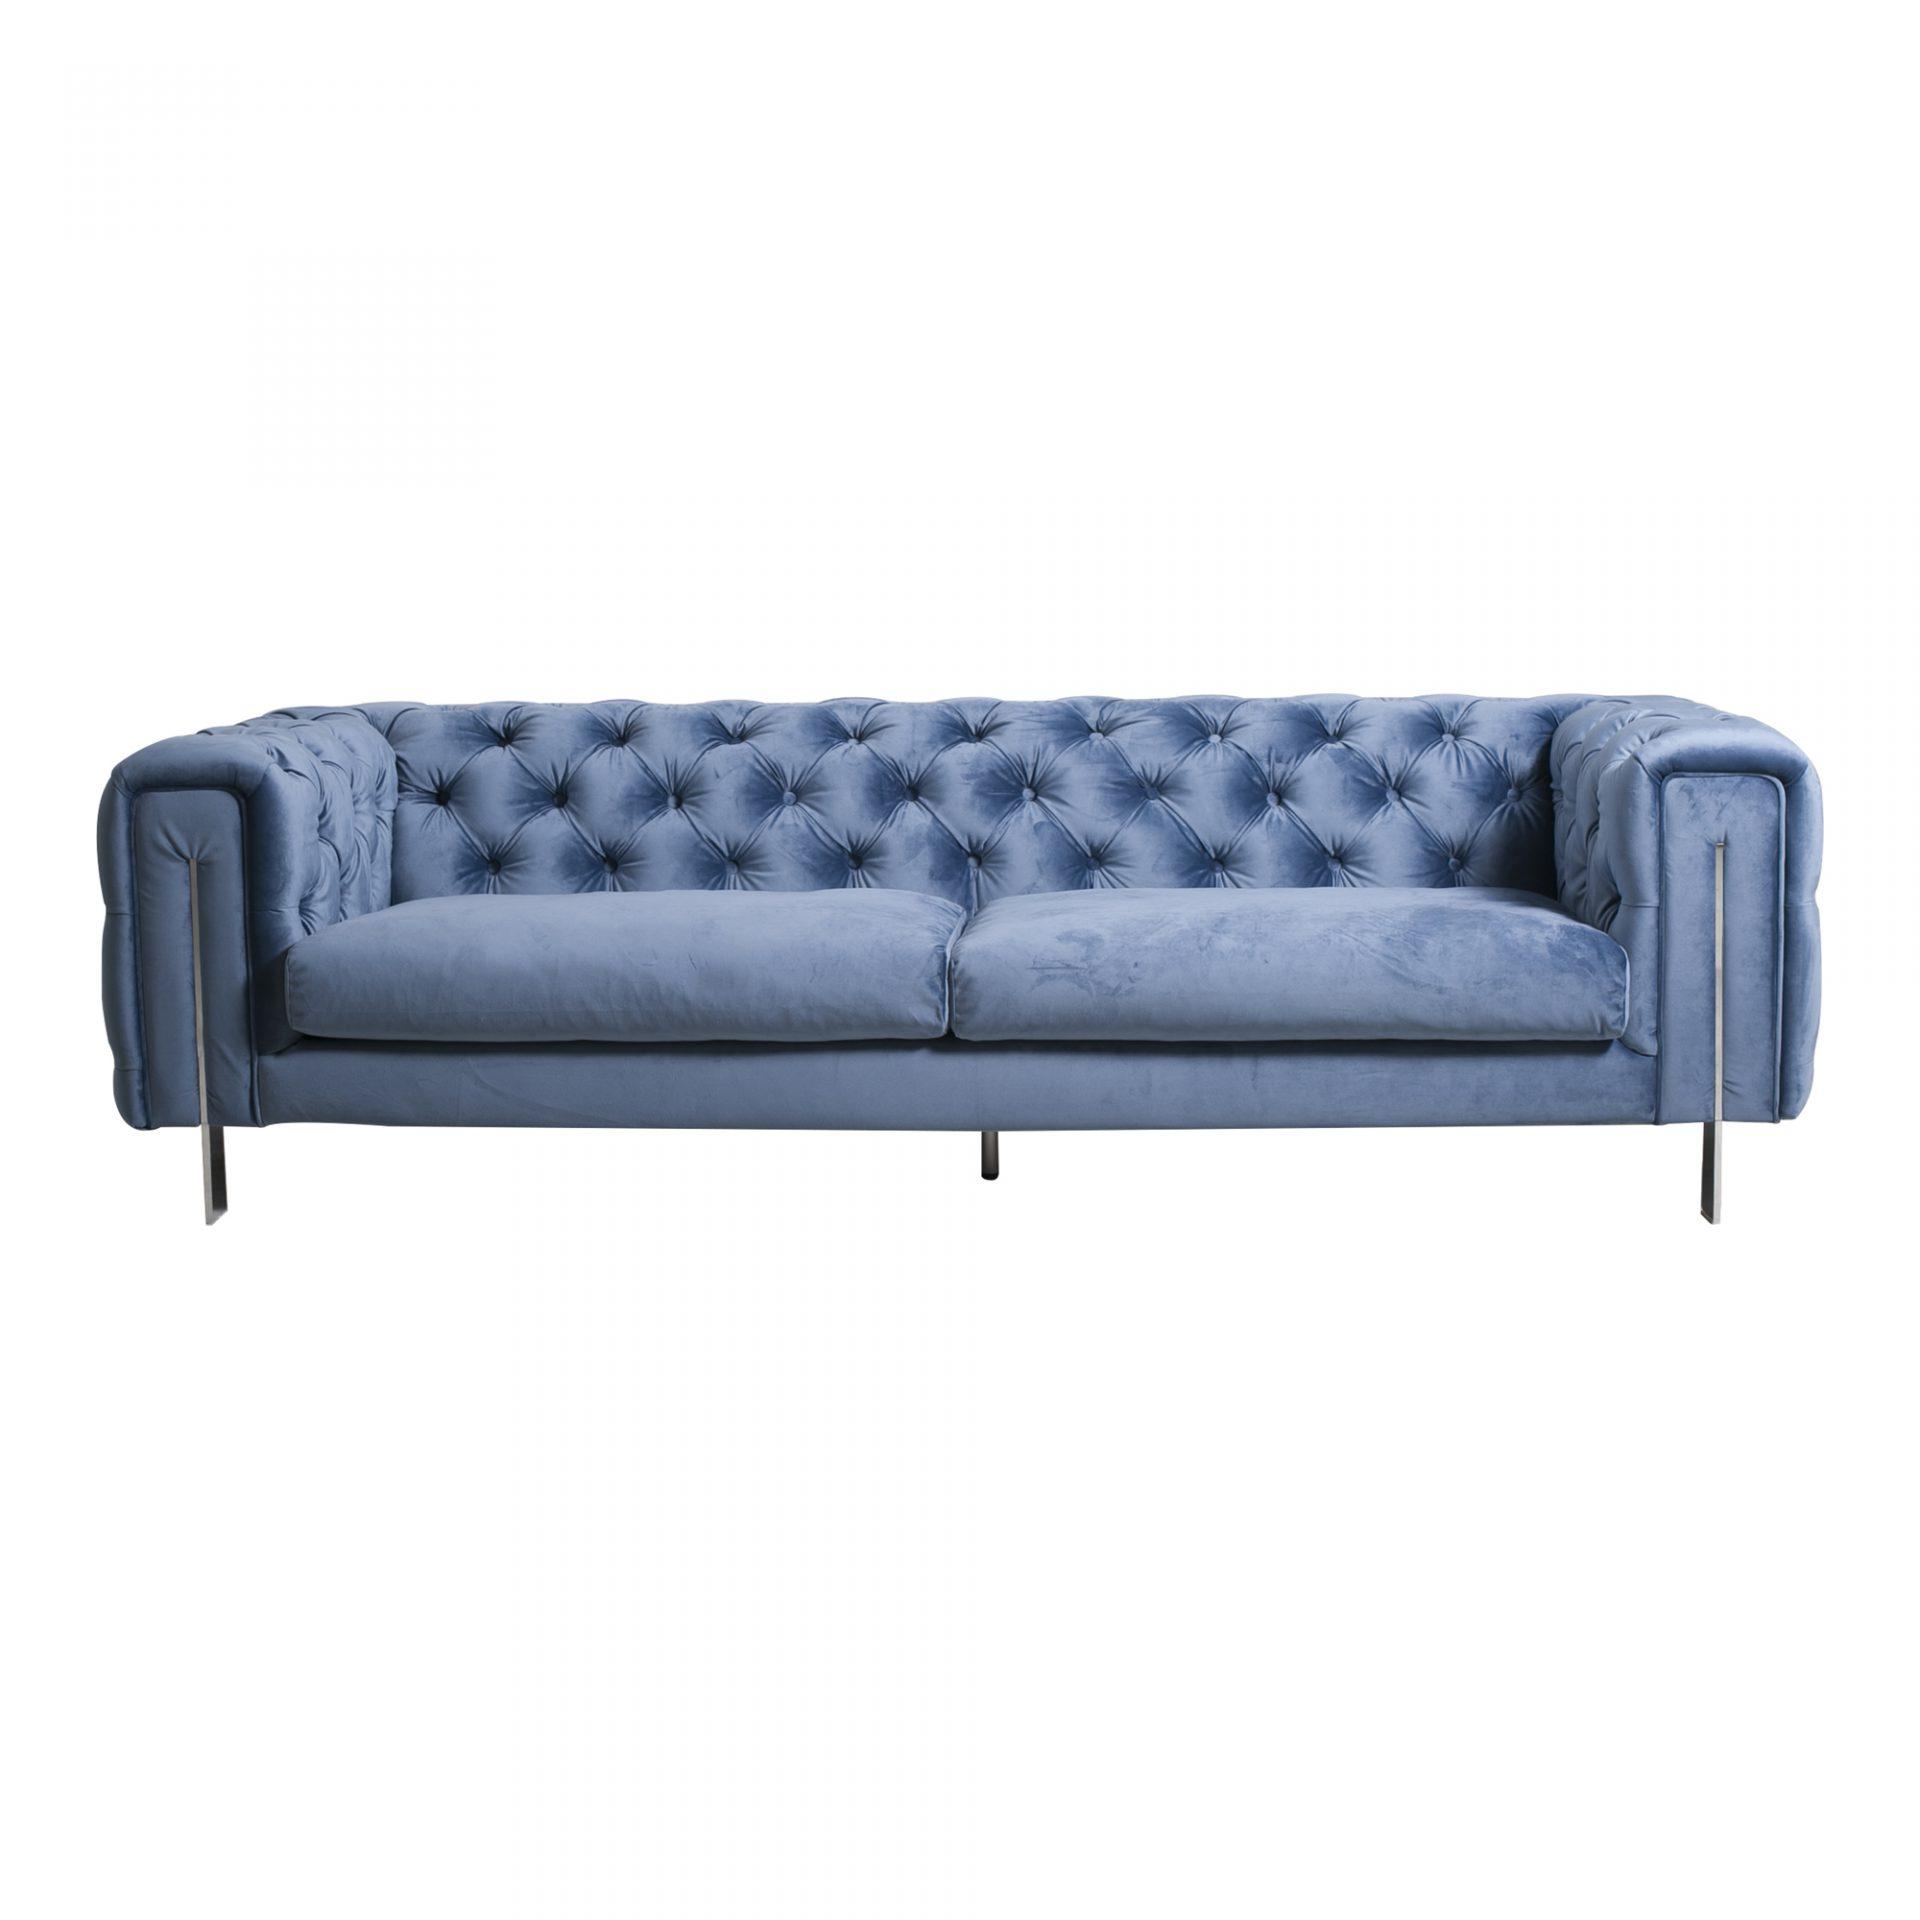 aqua sofa 3 seater corner storage futon bed courtney seat blue h interiors